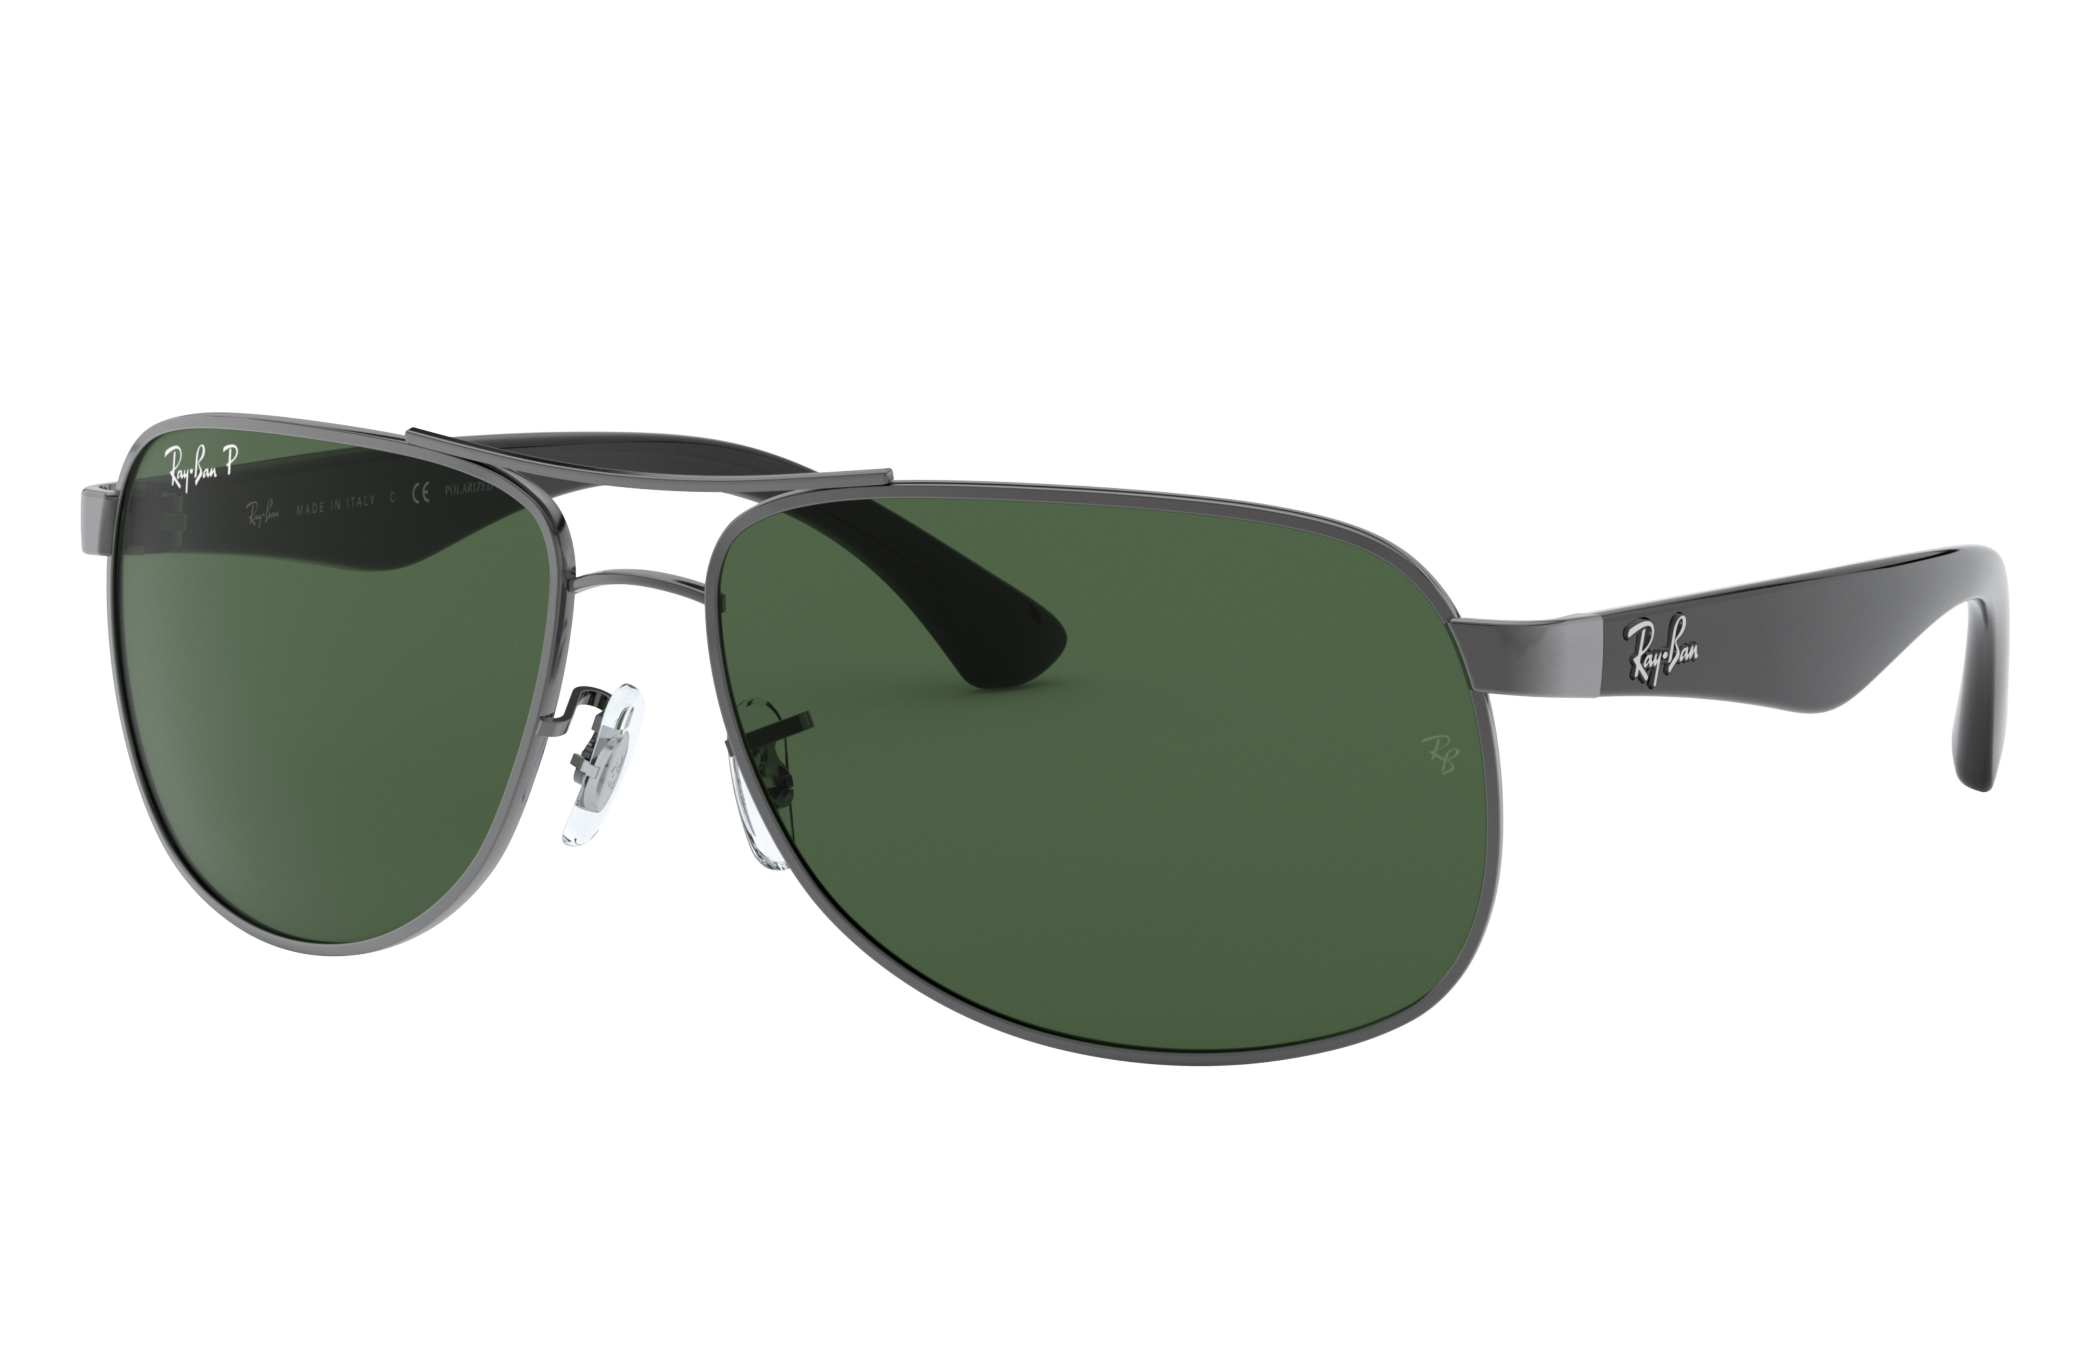 Ray-Ban Rb3502 Black, Polarized Green Lenses - RB3502